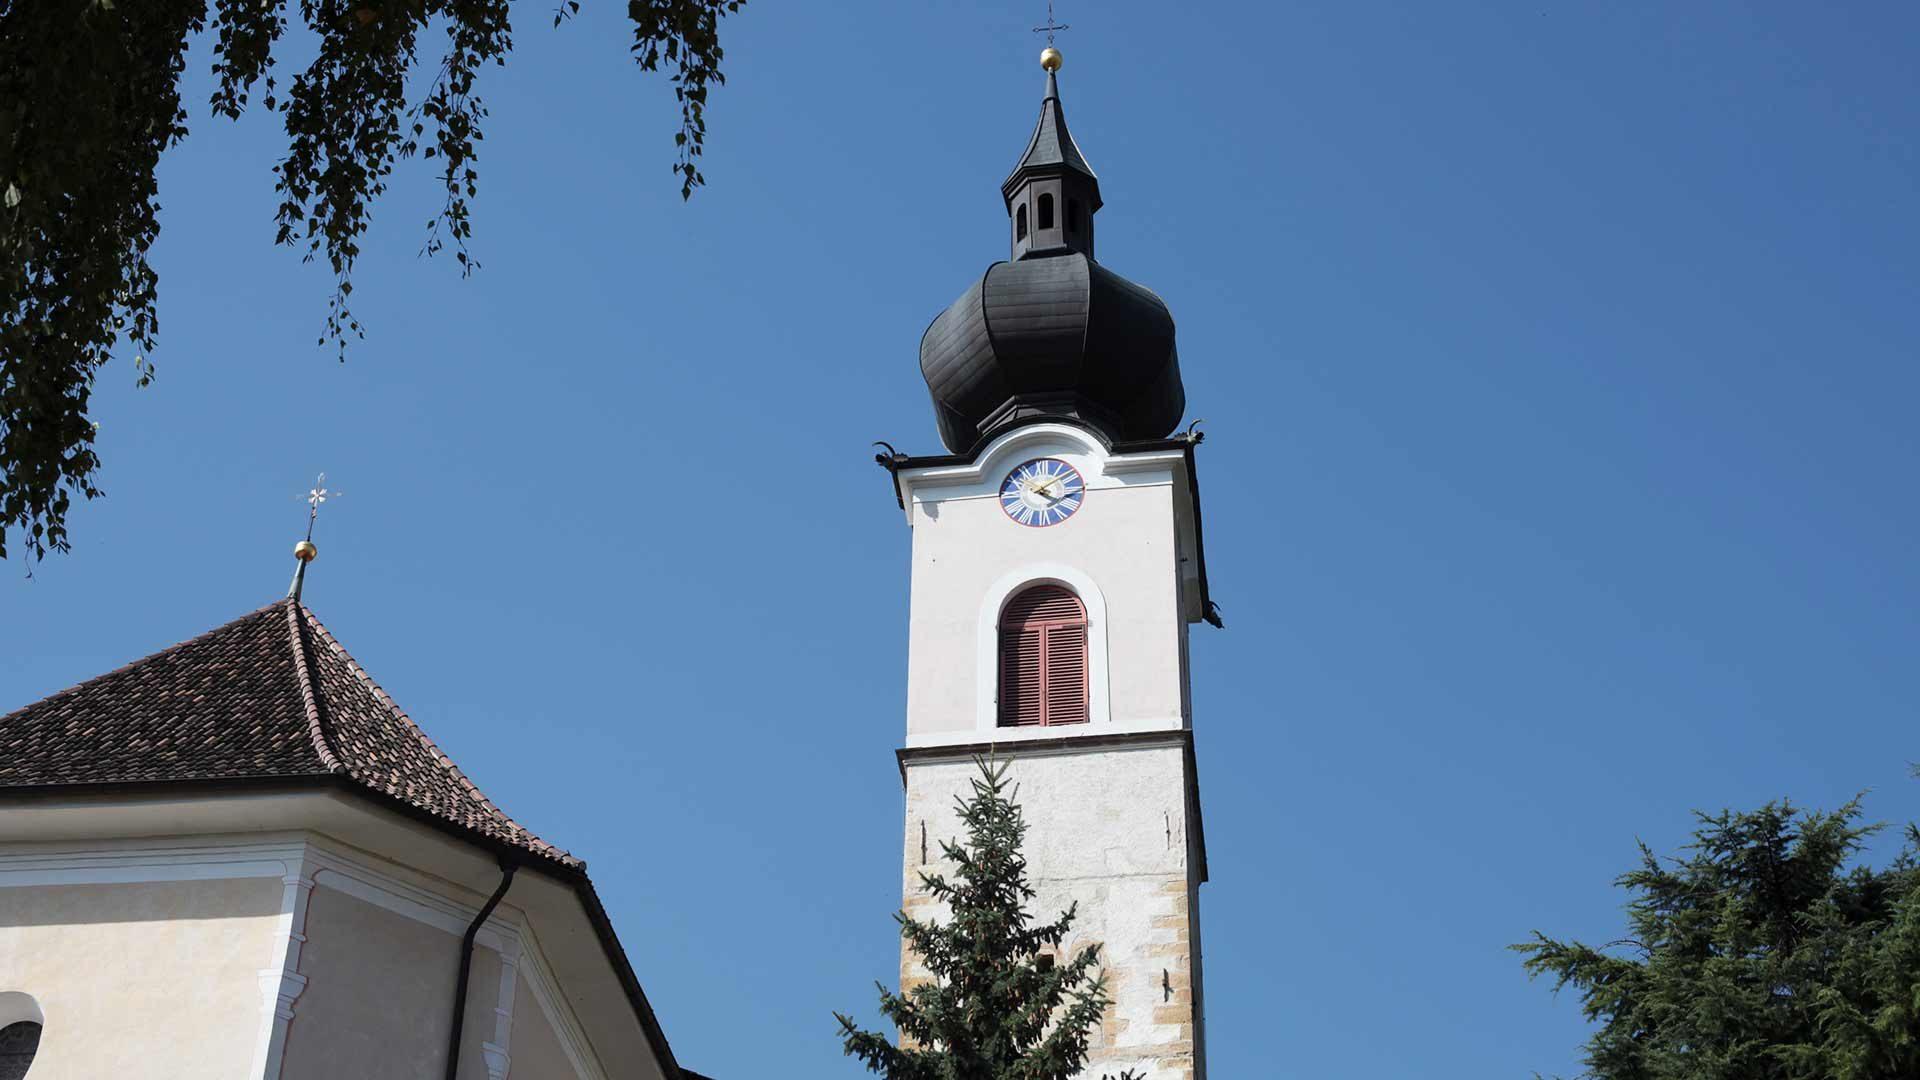 Pfarrkirche zum Hl. Ulrich - Nals